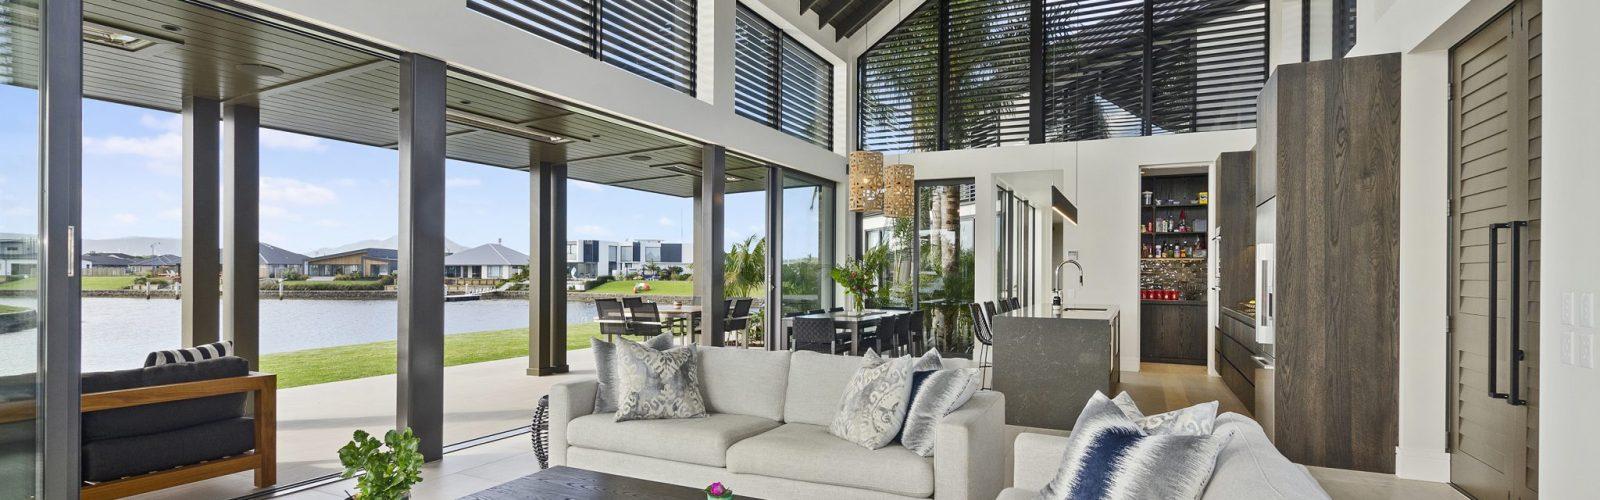 Marsden Cove, Northland Home Build - Header Image